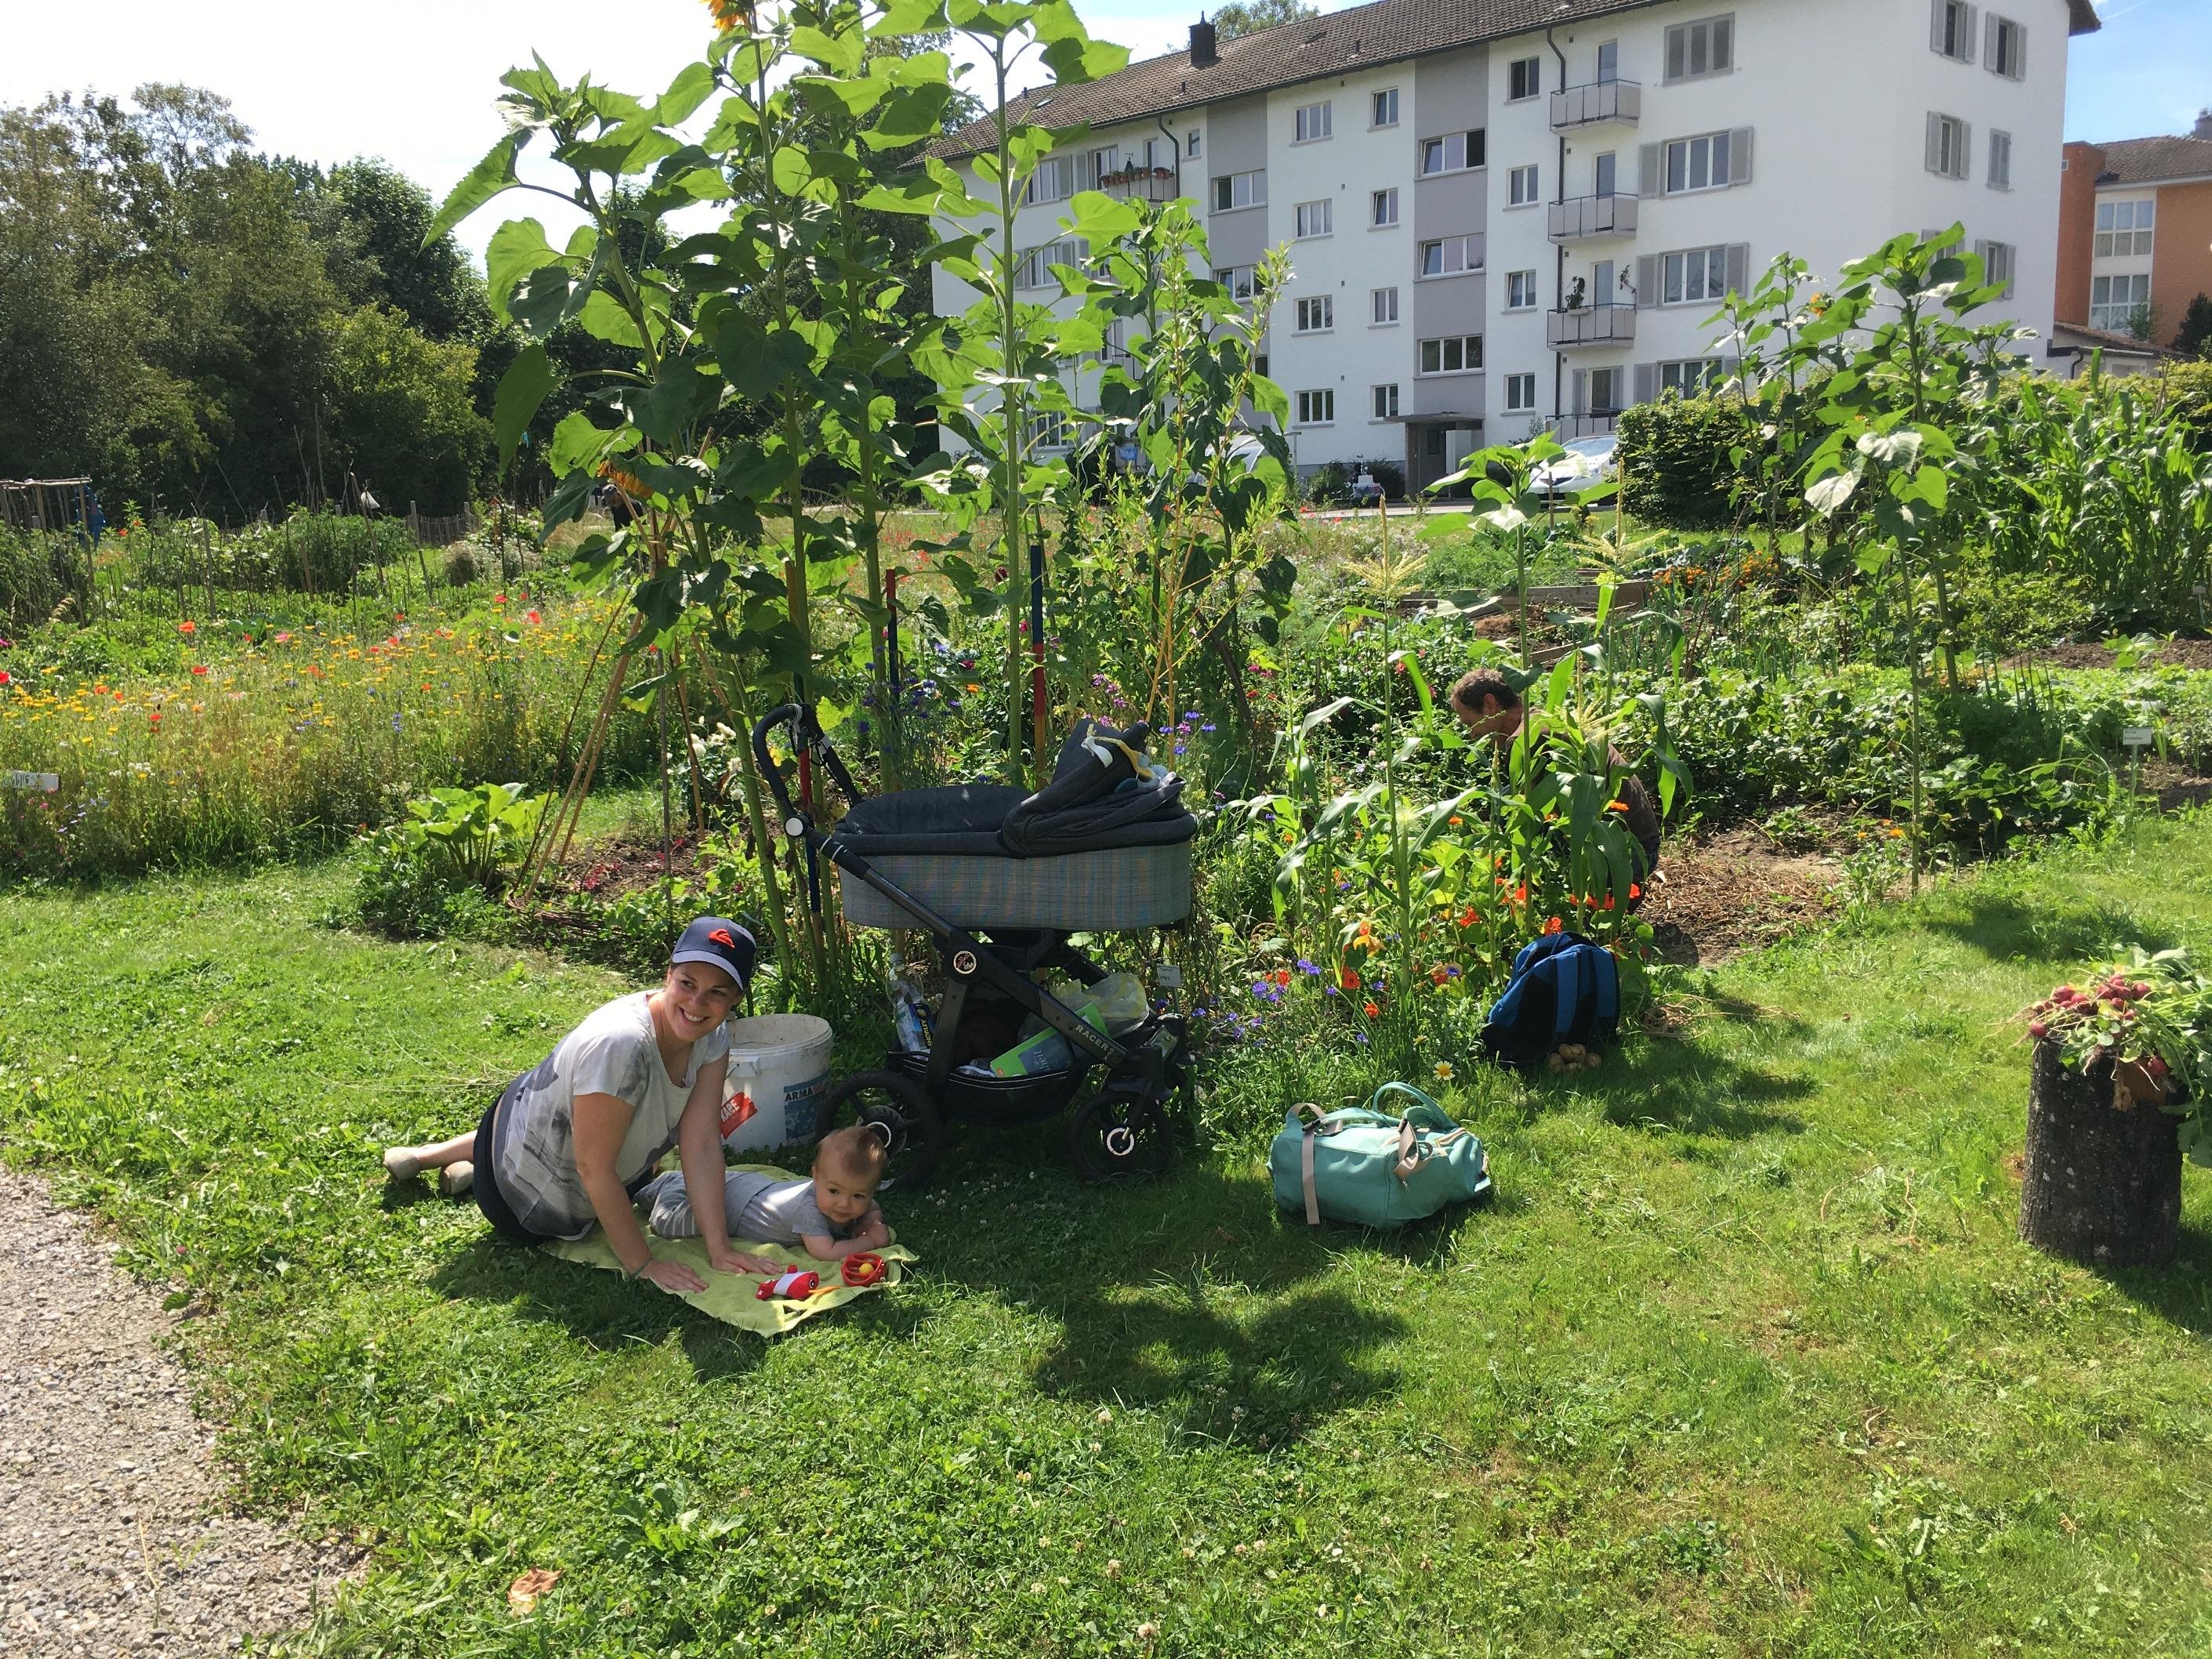 2020-07-19 Ogif Garten, 05